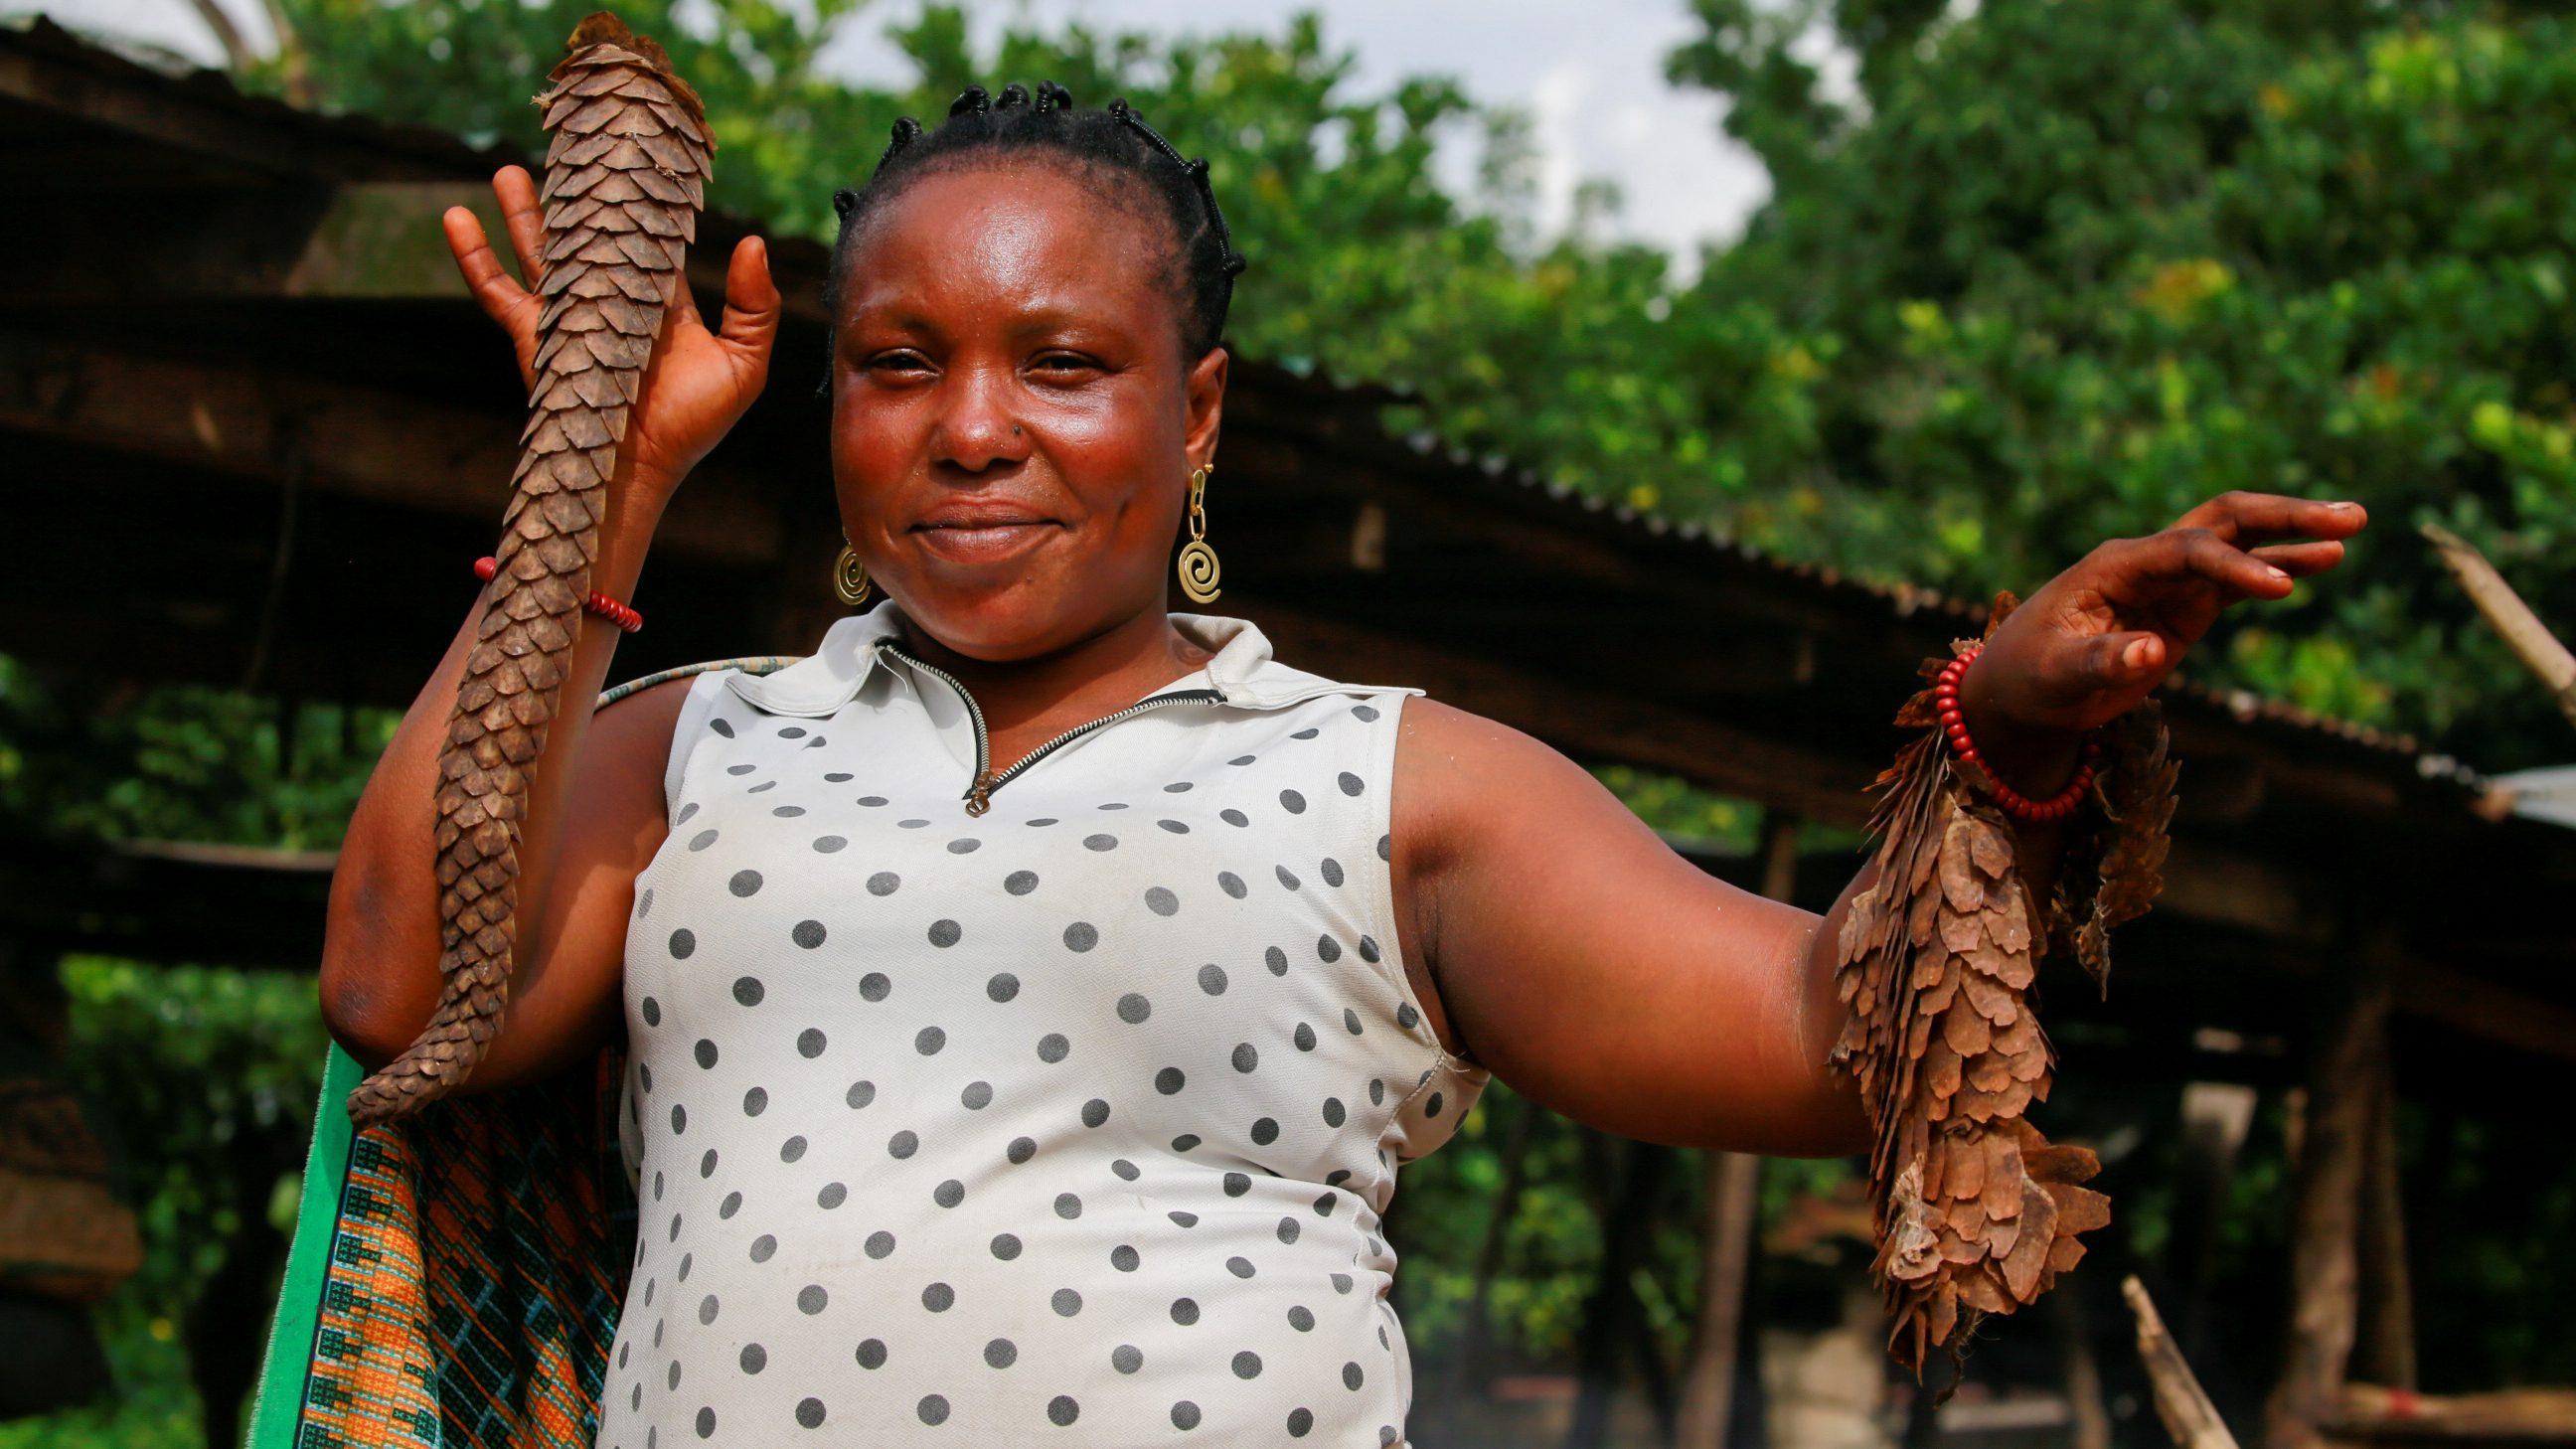 Despite coronavirus fears, Nigeria has taken no action to stop its pangolin trade